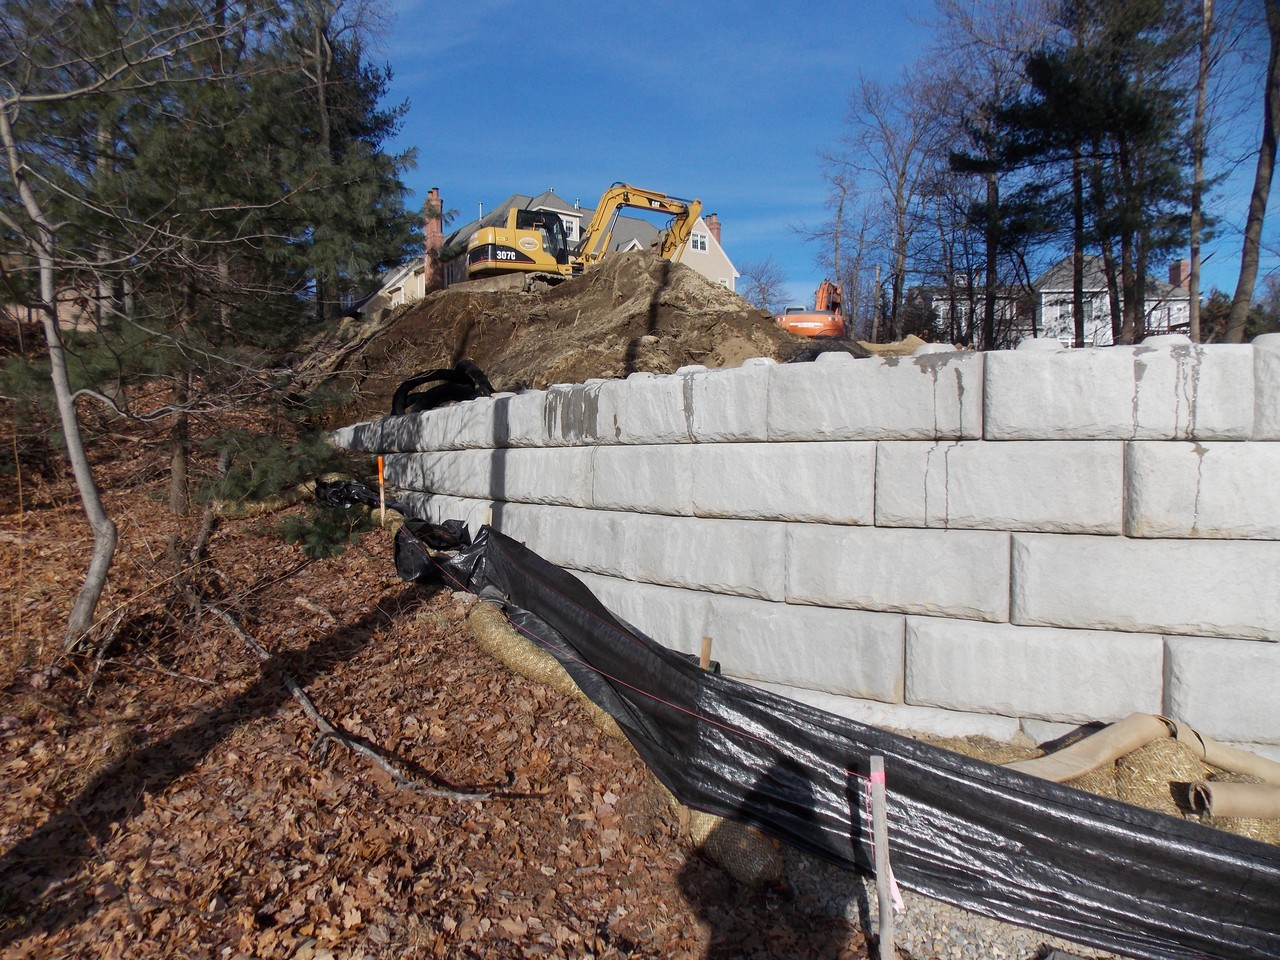 Retaining Wall at Branca Residence, Shrewsbury, MA